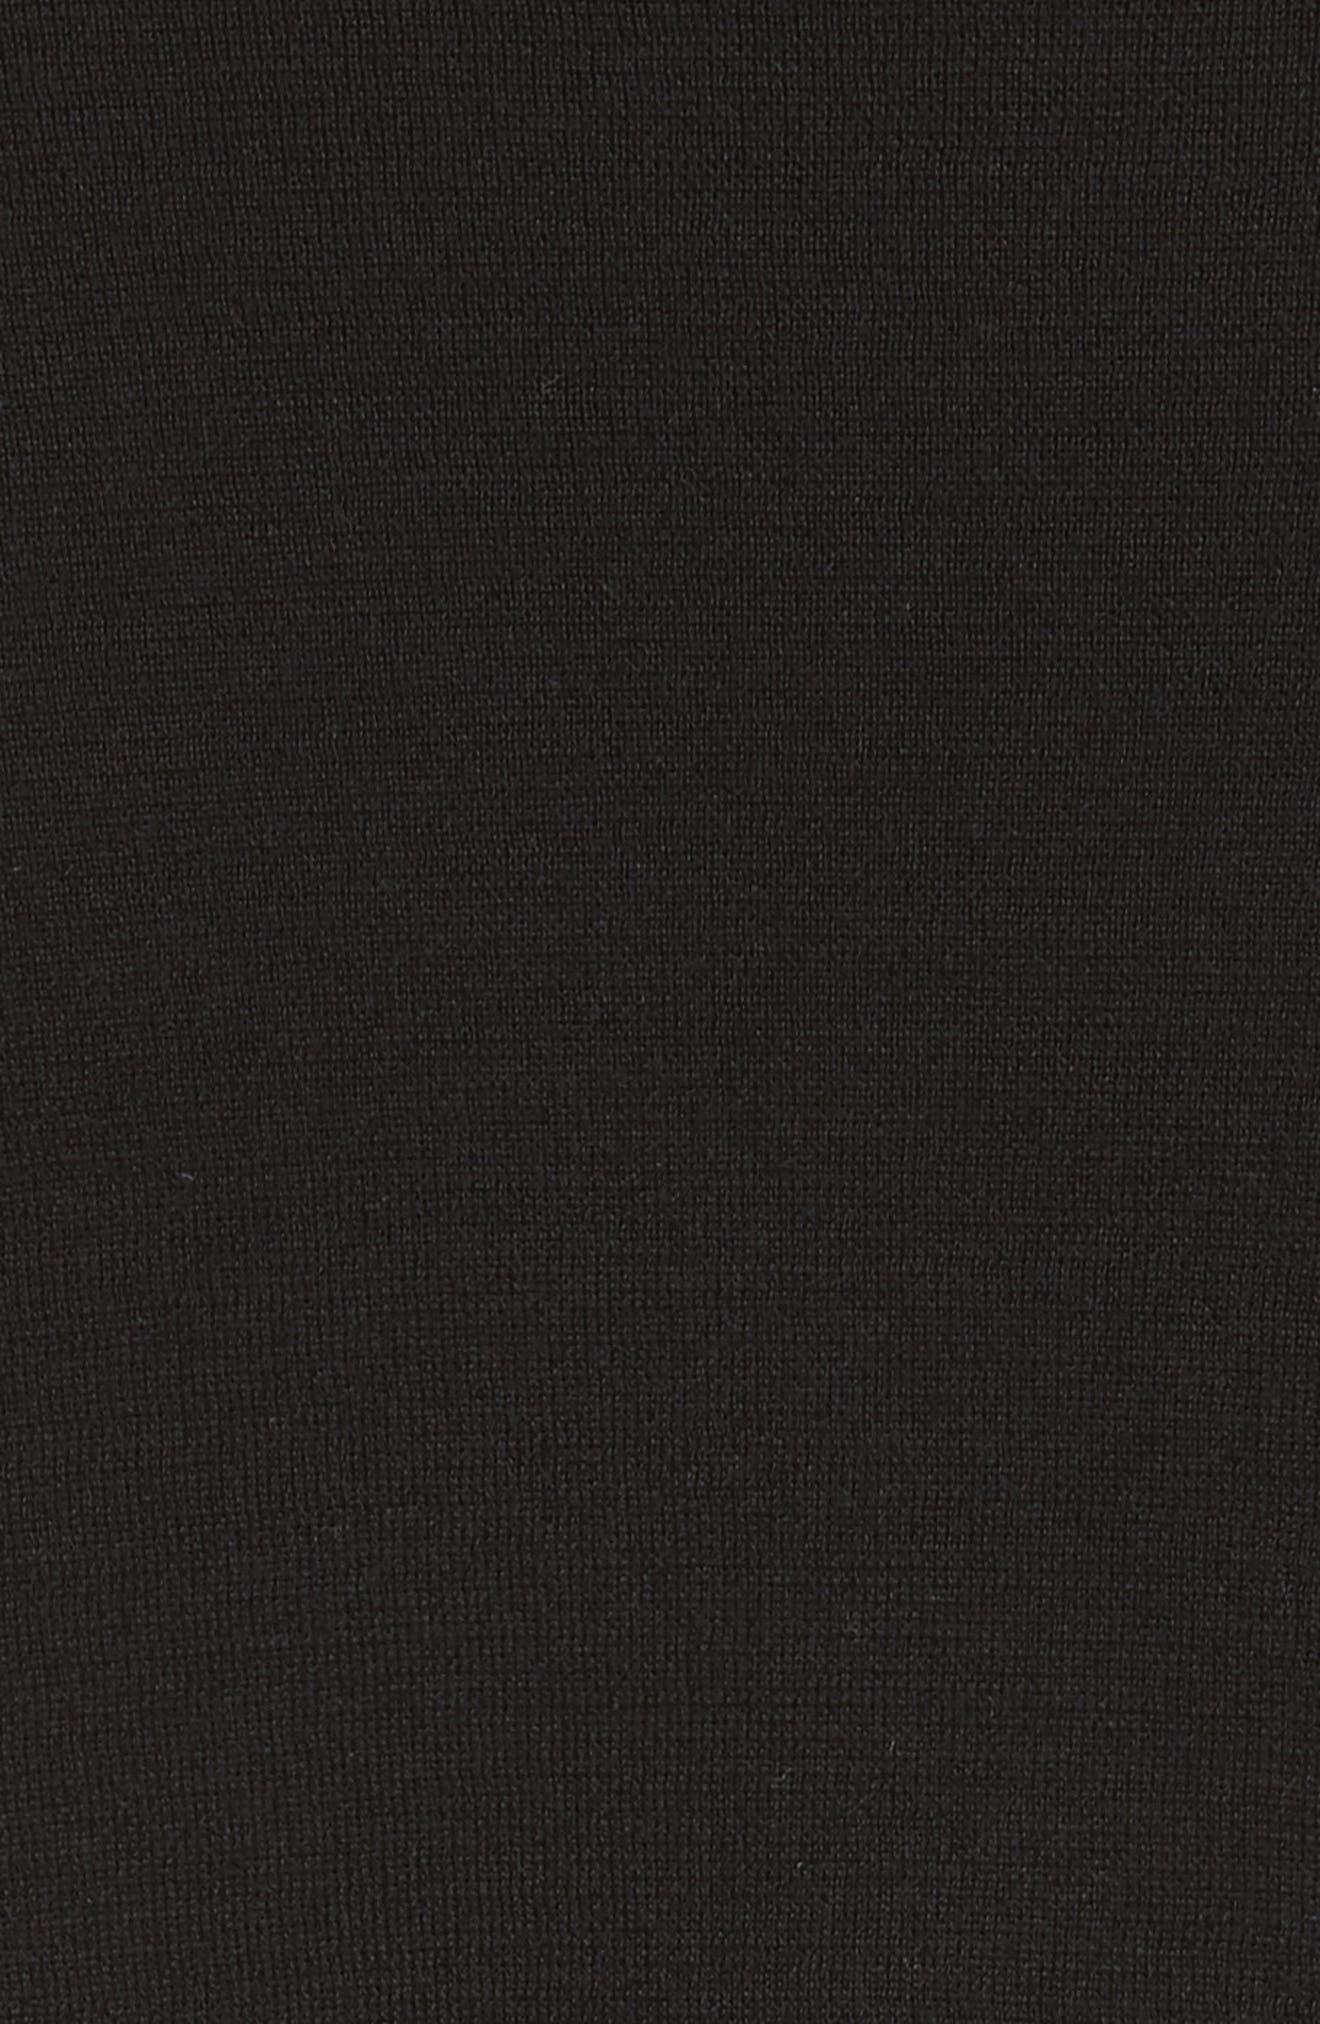 Logan Chain Stripe Mixed Media Bomber,                             Alternate thumbnail 6, color,                             001